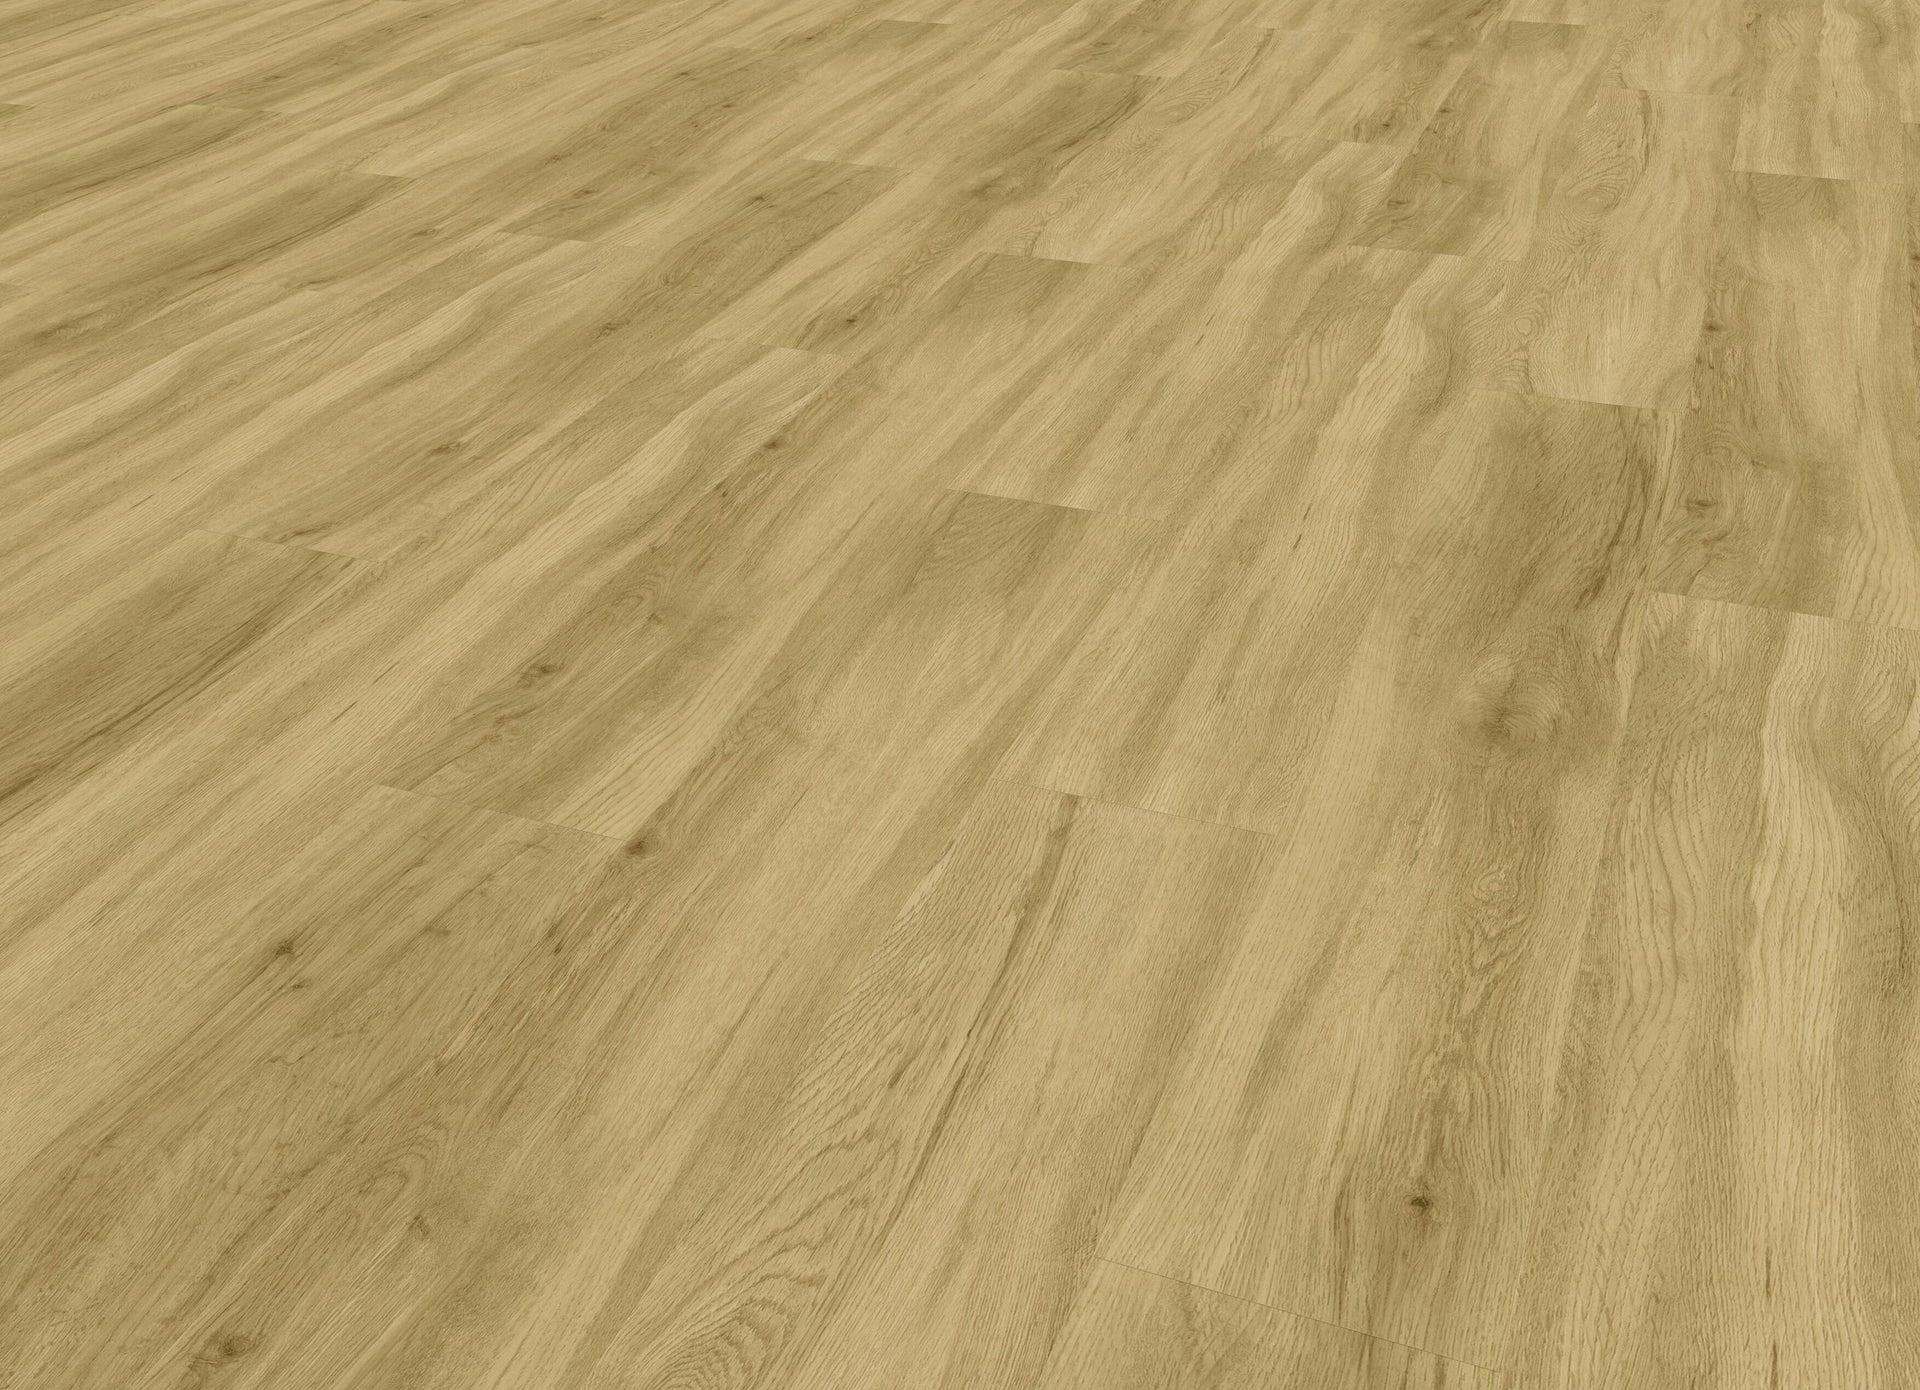 Pavimento PVC flottante clic+ Sensoclic 30 Lord honey Sp 4.2 mm marrone - 4